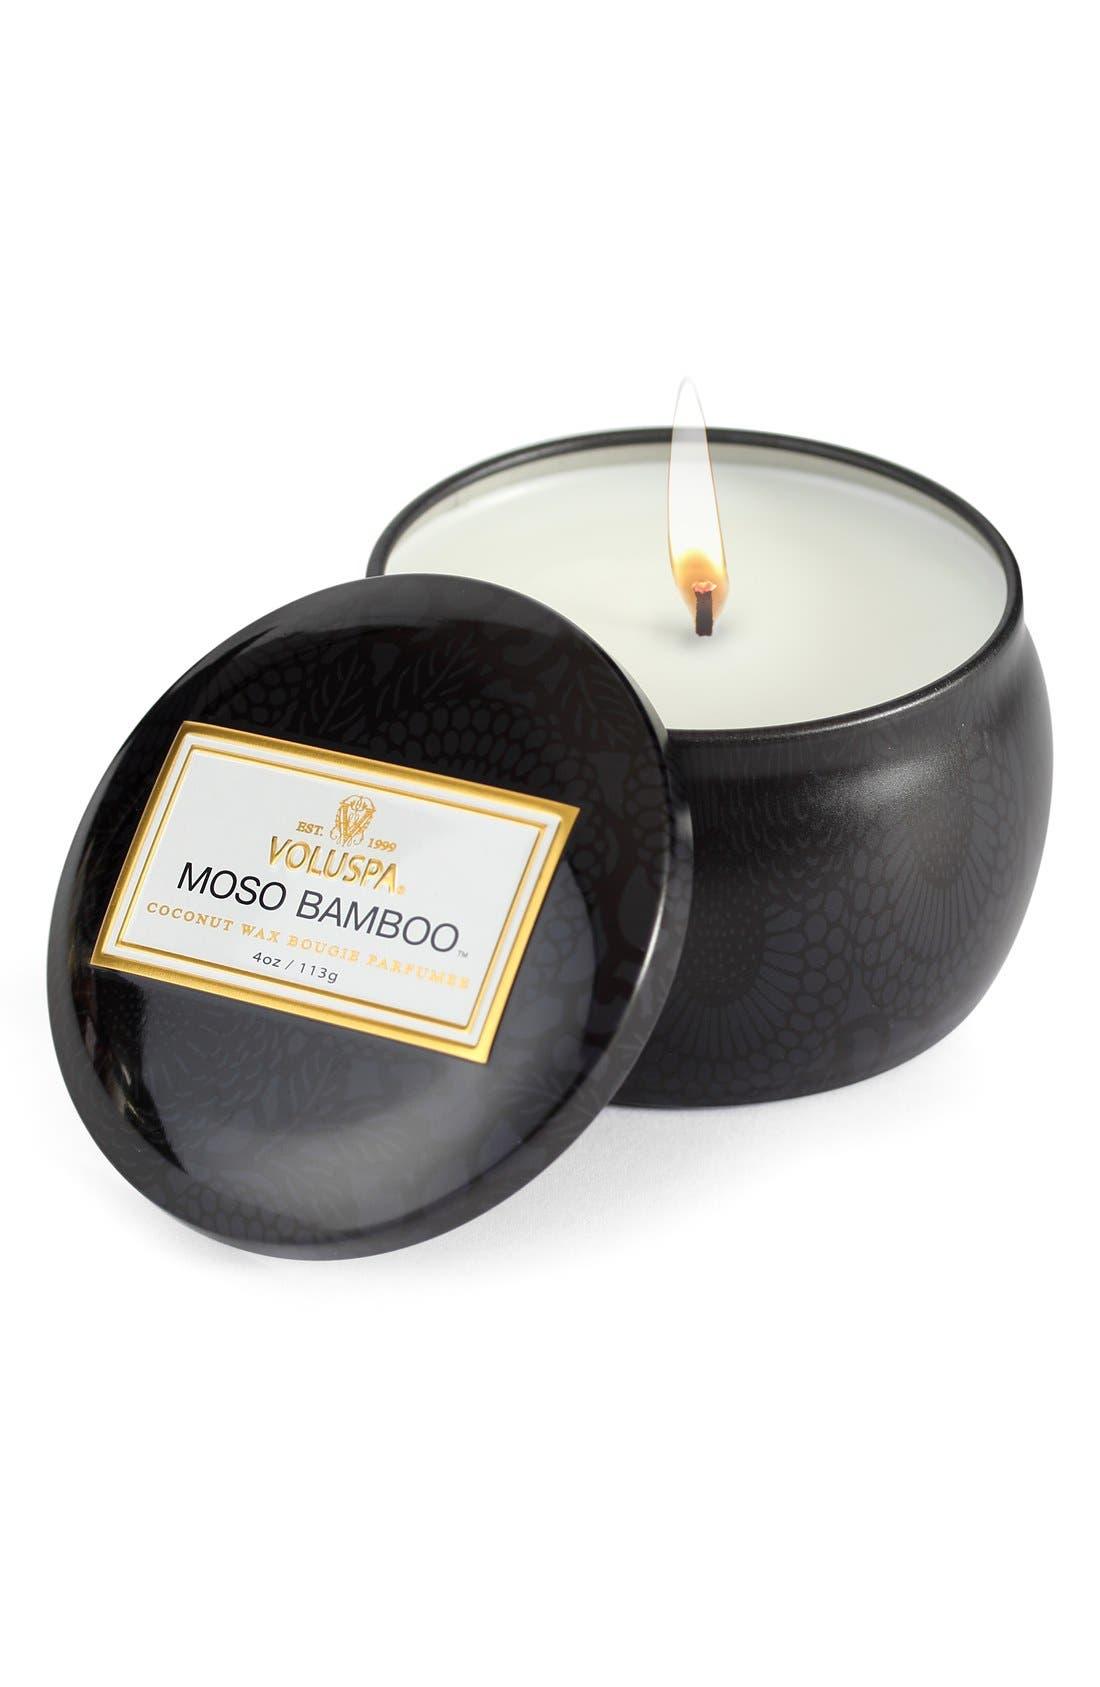 Alternate Image 1 Selected - Voluspa 'Japonica - Moso Bamboo' Petite Decorative Candle